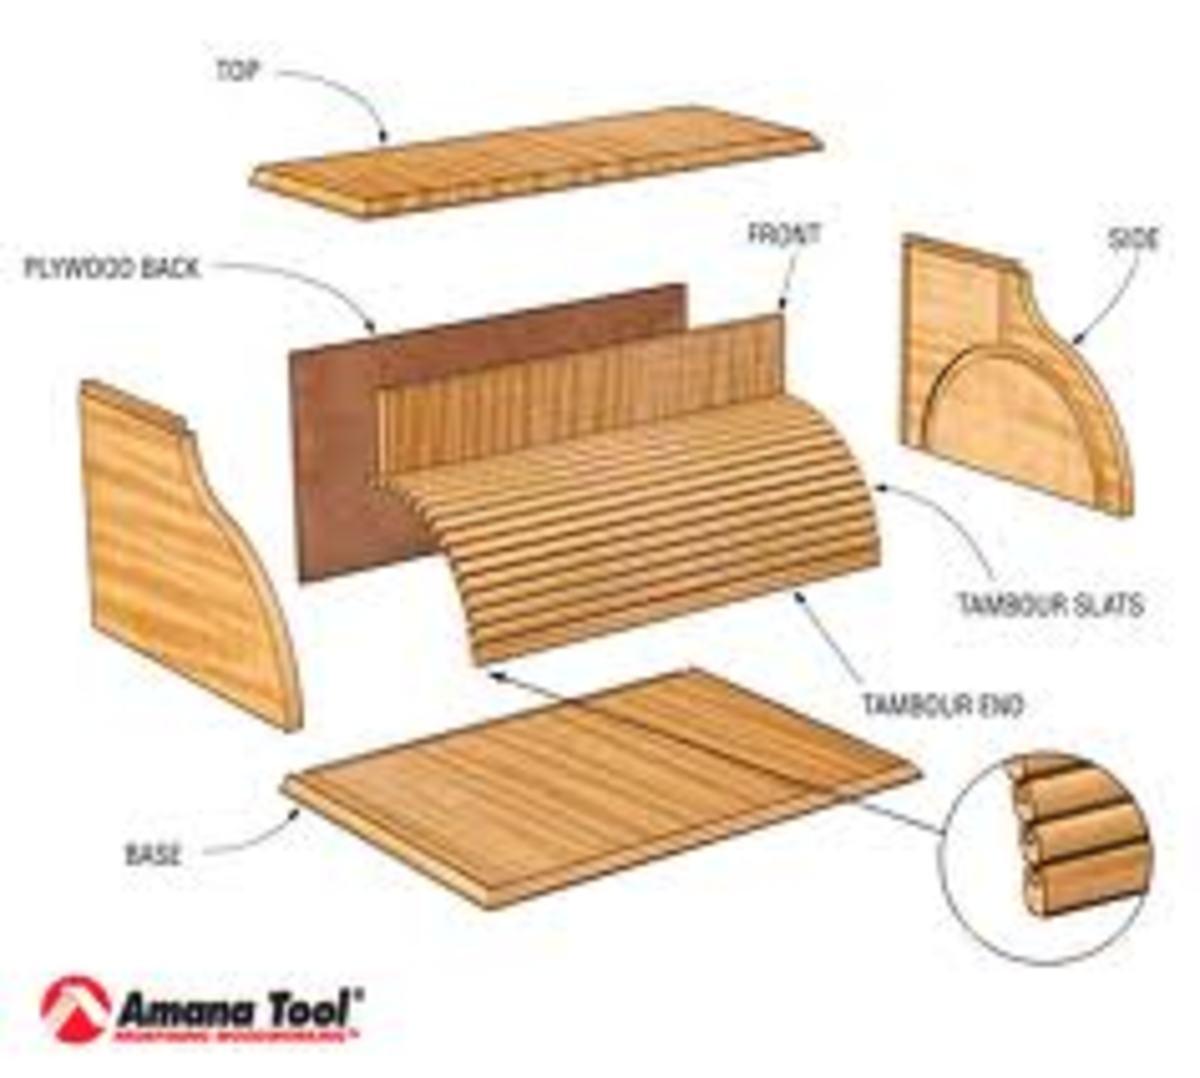 roll top desk replacement parts ethridge207 rh ethridge207 wordpress com roll top desk restoration parts riverside roll top desk parts